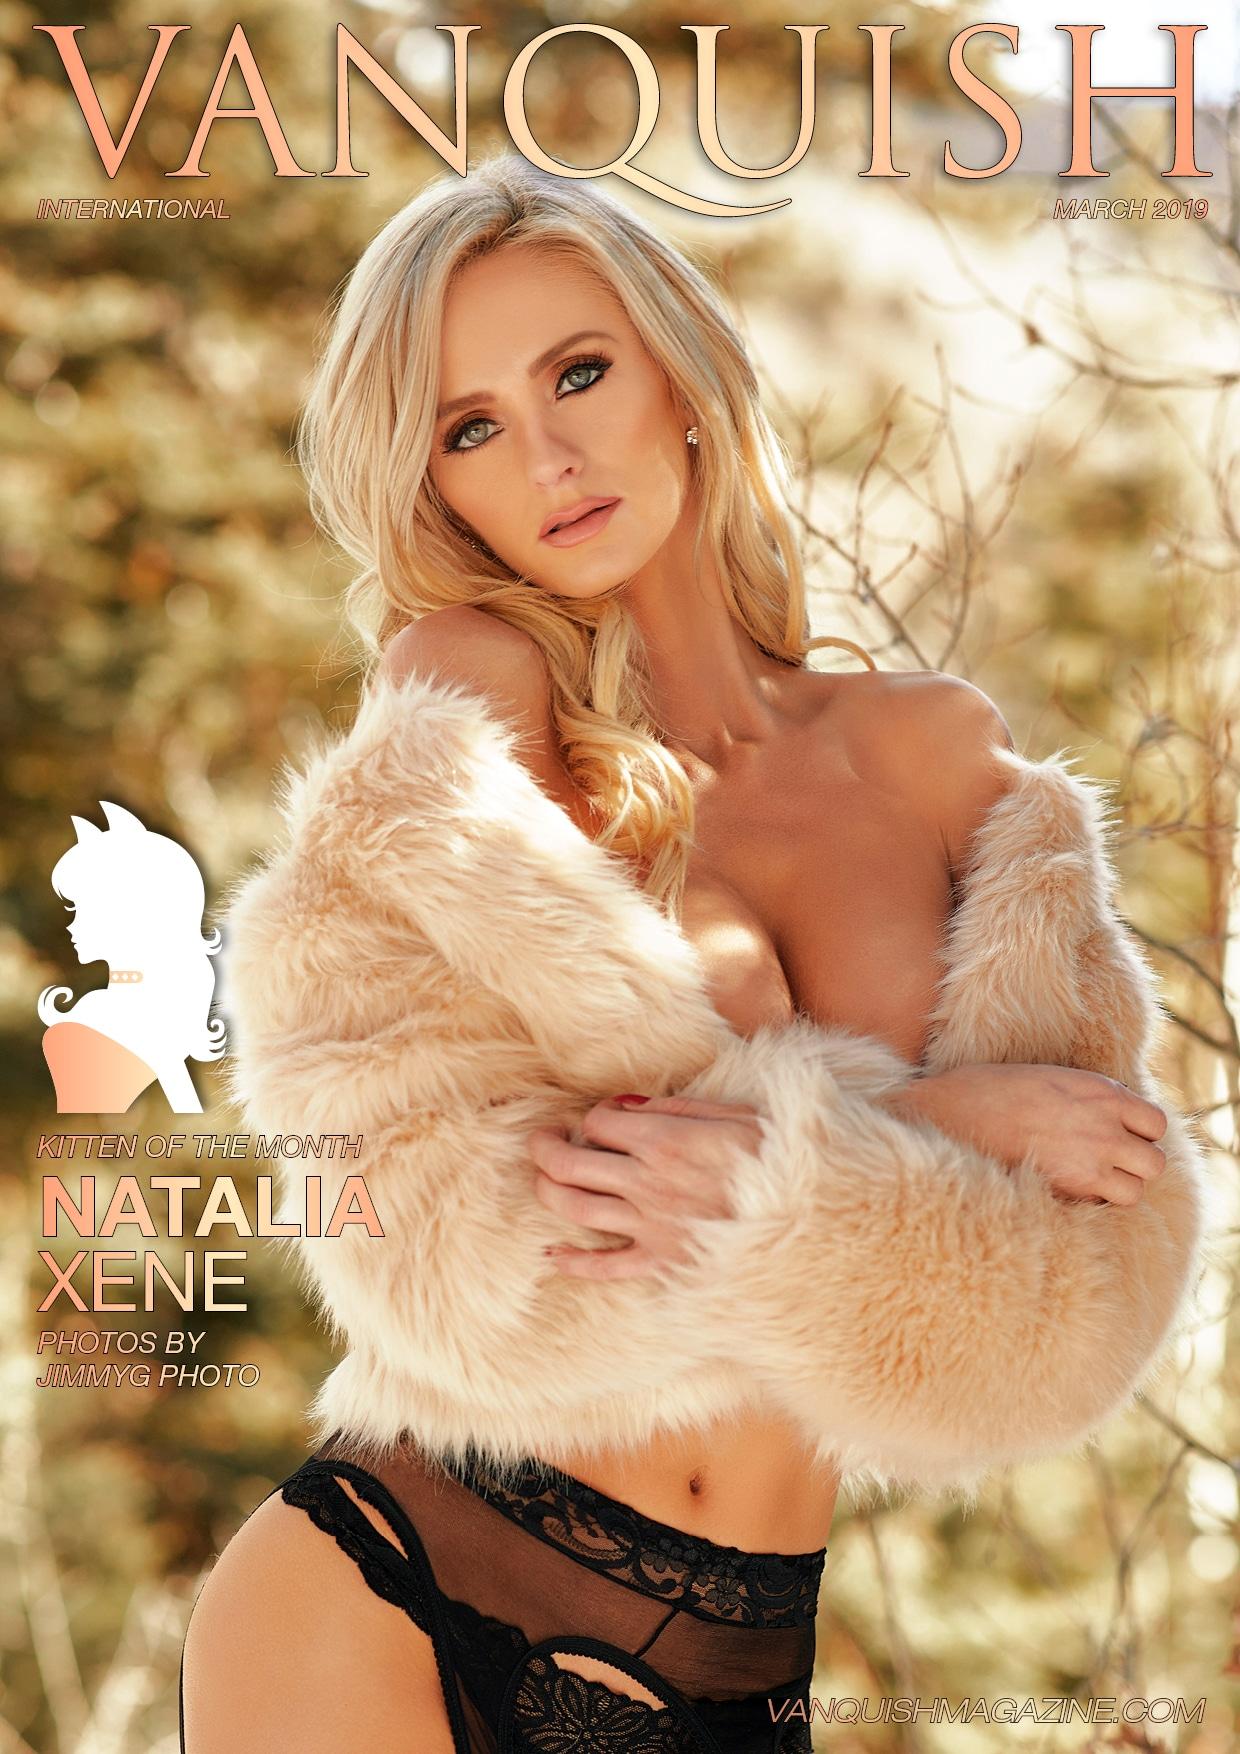 Vanquish Magazine – March 2019 – Natalia Xene